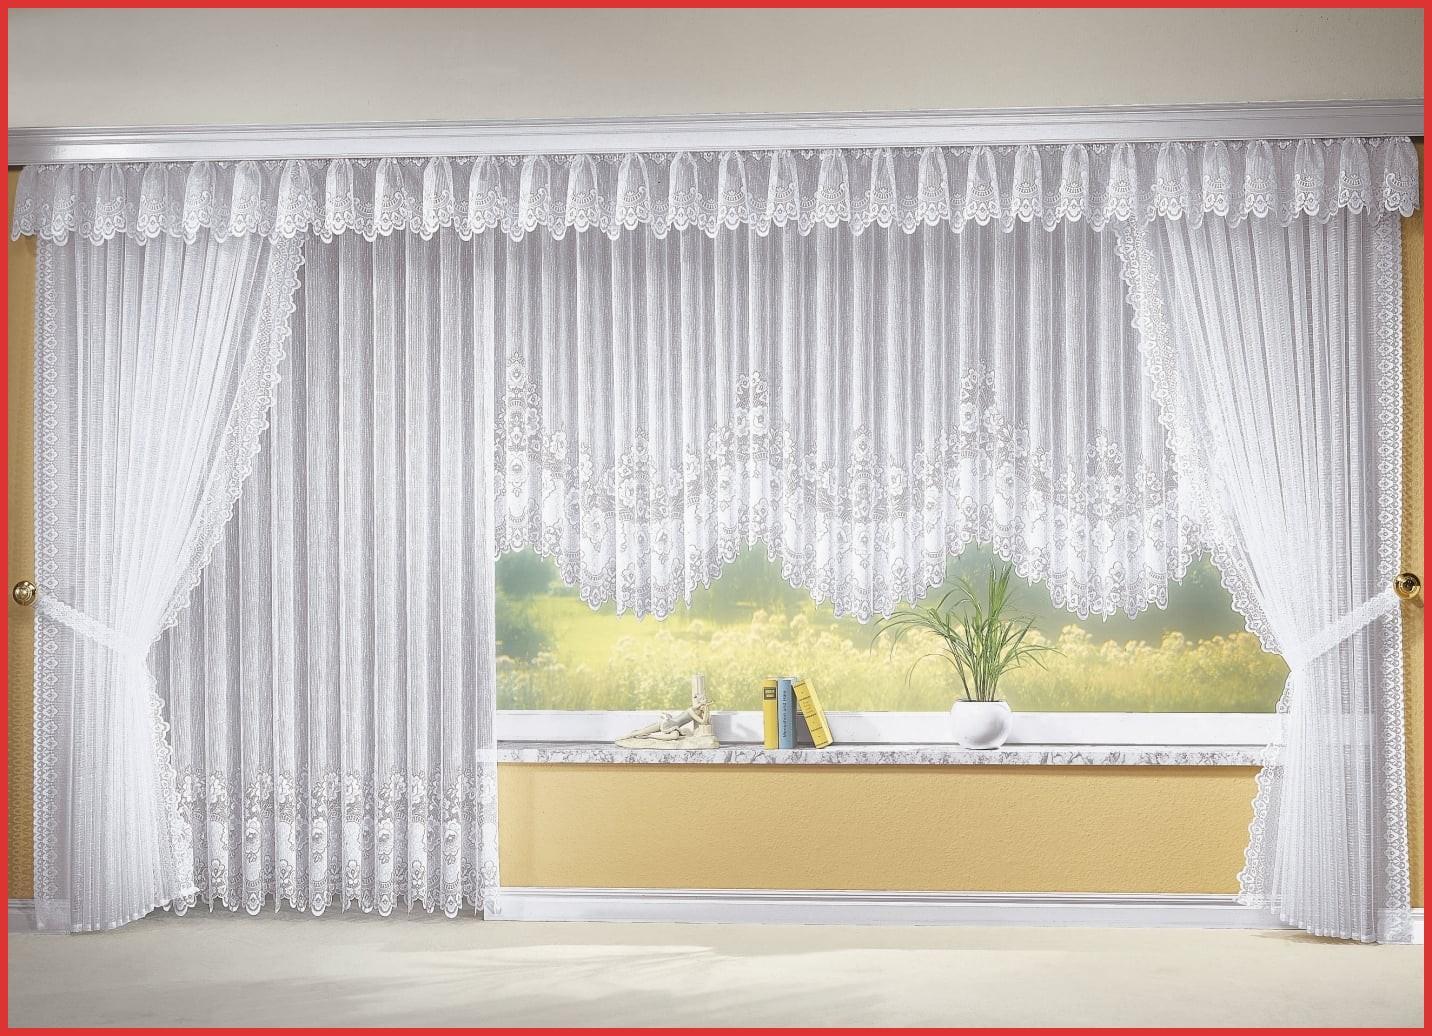 Full Size of Gardinen Küchenfenster Wohnzimmer Für Scheibengardinen Küche Schlafzimmer Fenster Die Wohnzimmer Gardinen Küchenfenster